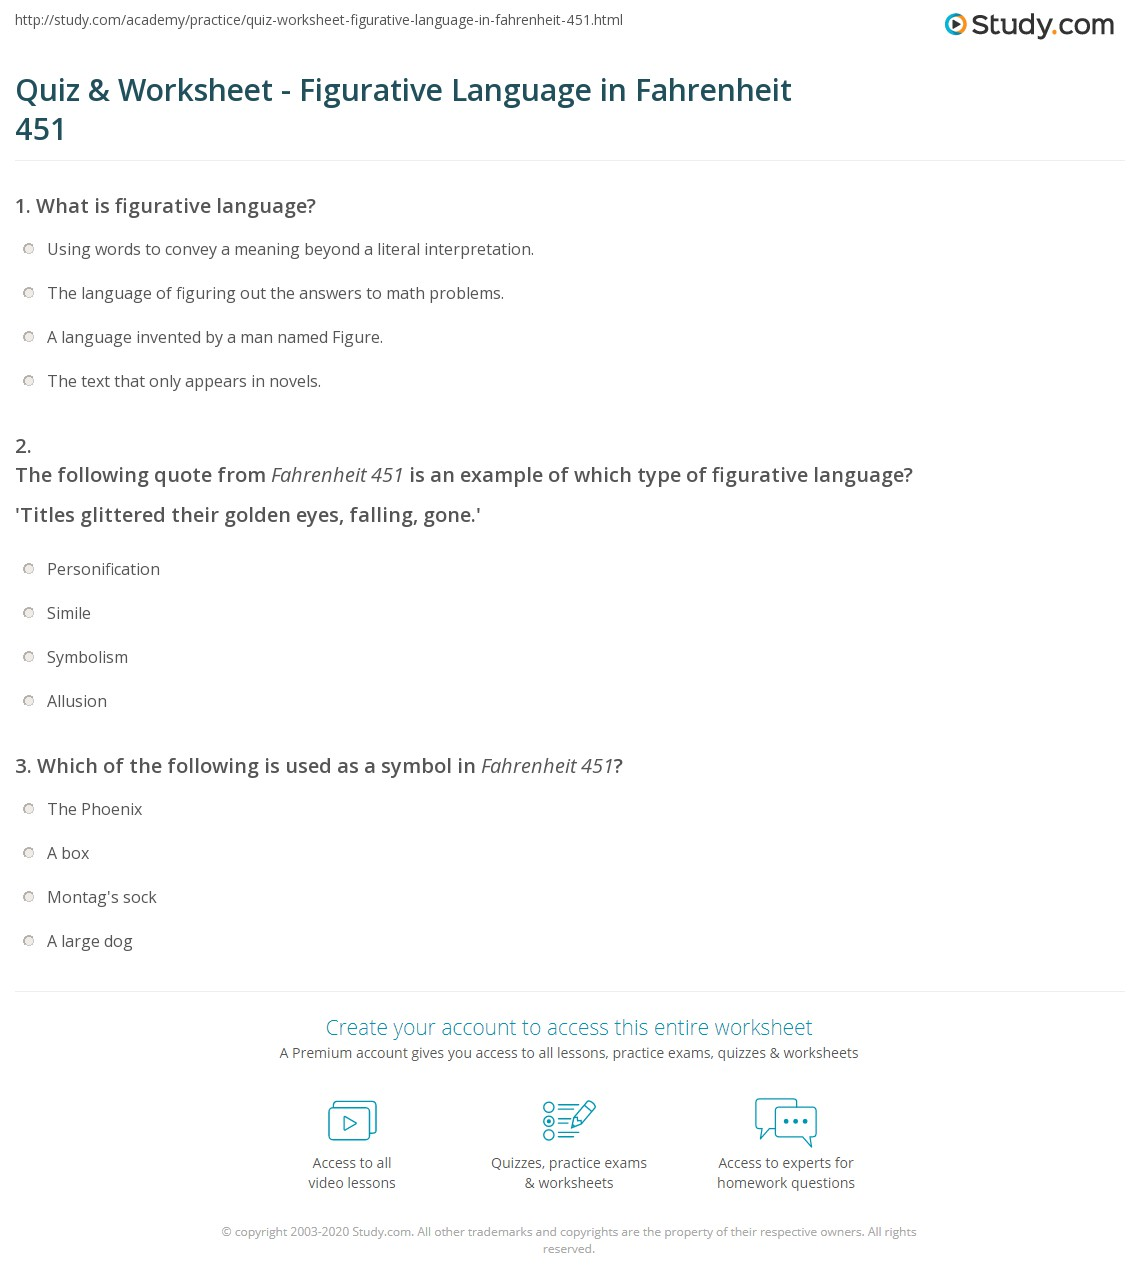 Worksheets Fahrenheit 451 Worksheets quiz worksheet figurative language in fahrenheit 451 study com print worksheet